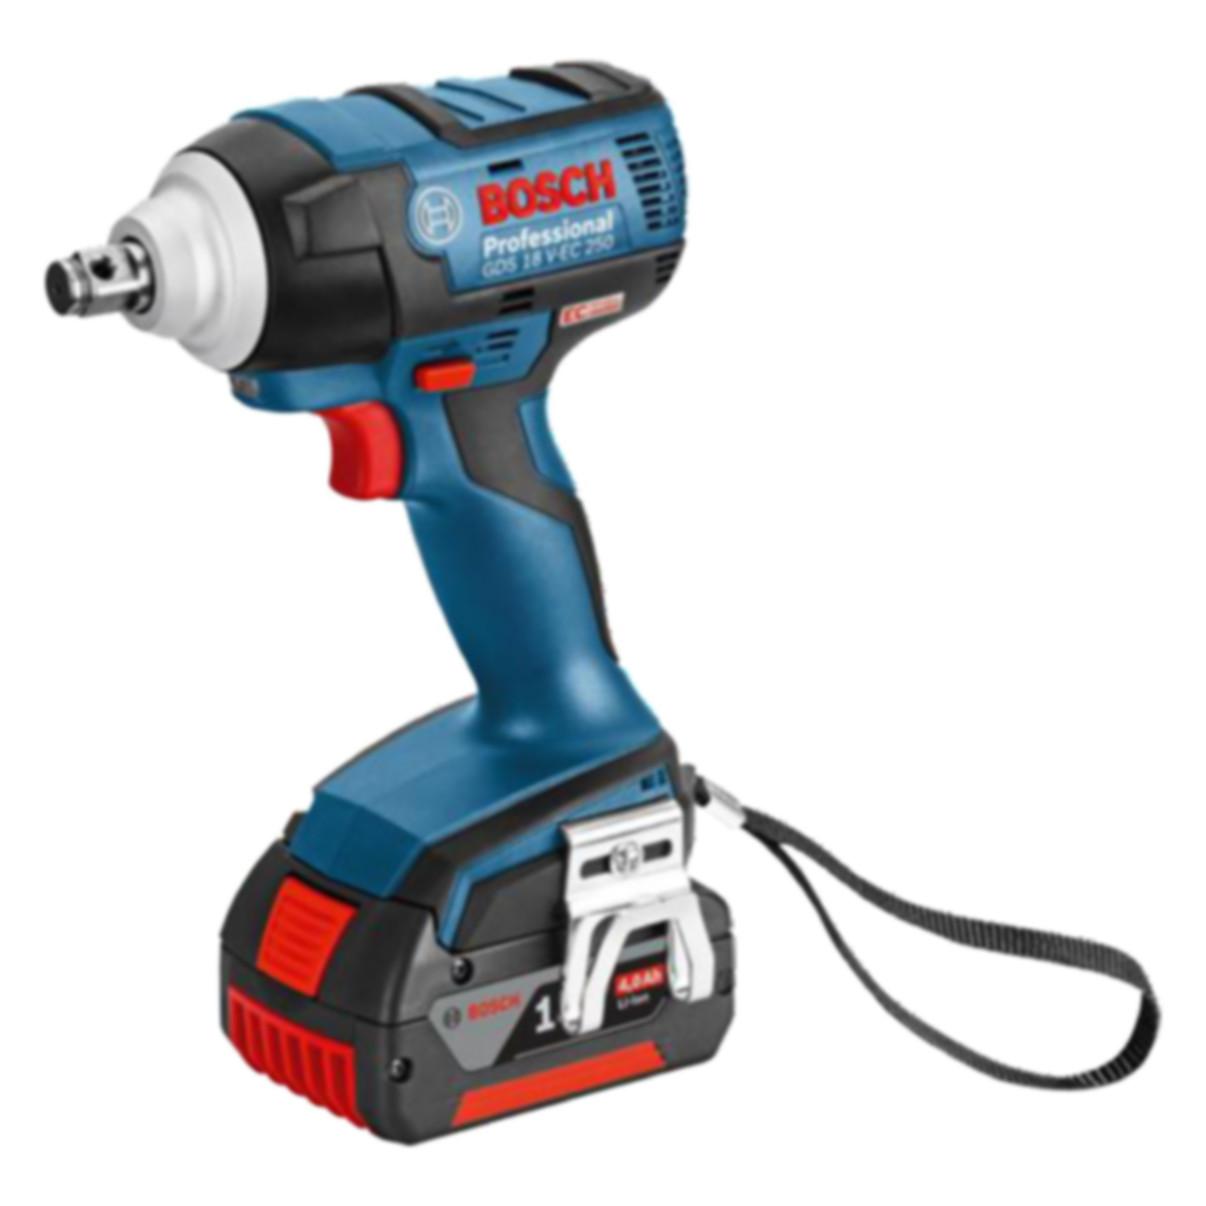 GDS 18 V-EC 250 Professional